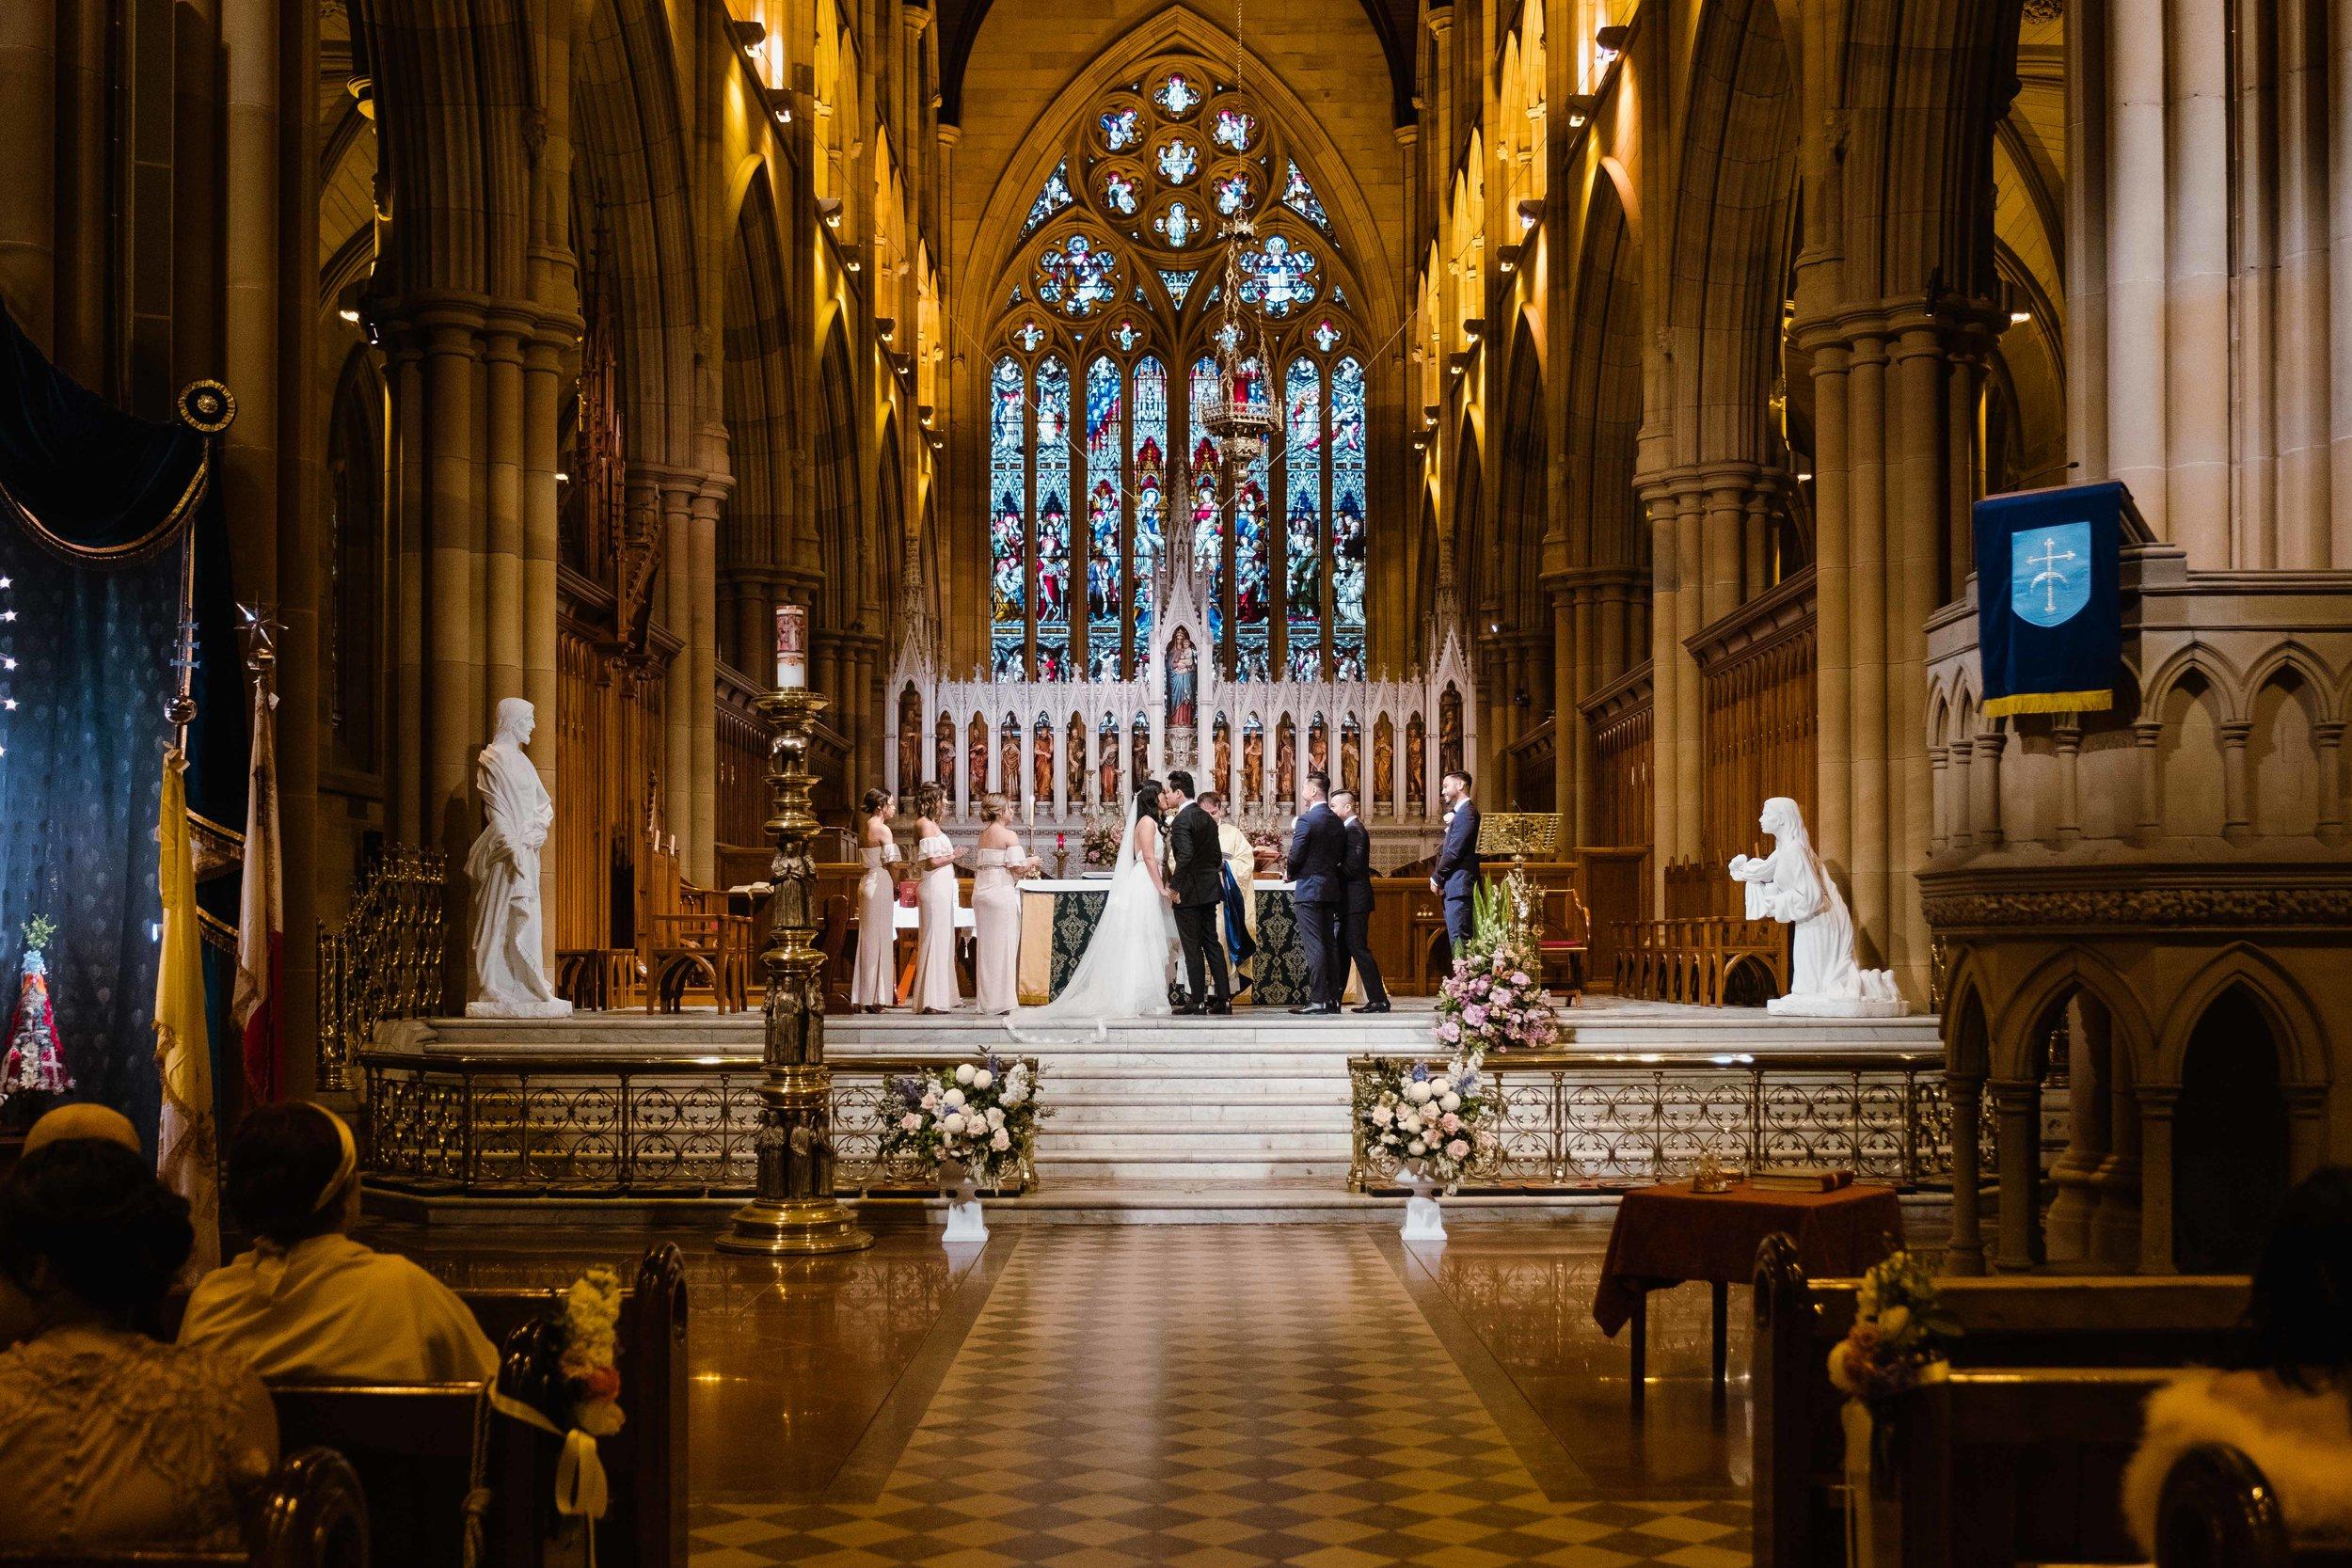 Maria and Gerald Sydney wedding by Milton Gan Photography 16.jpg